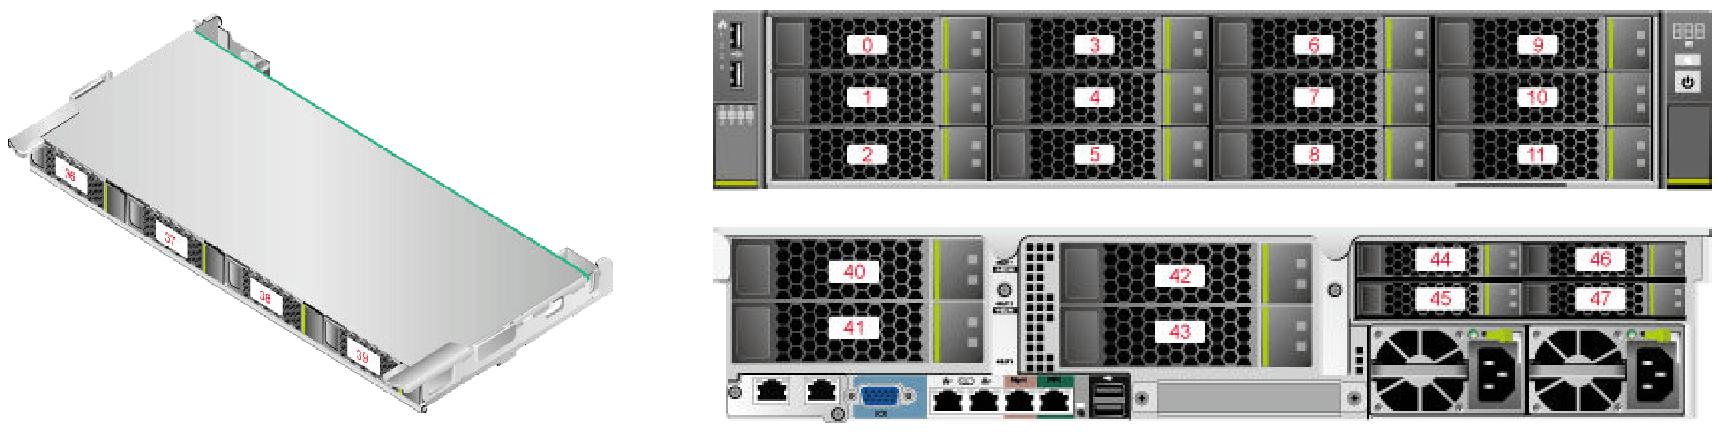 Huawei FusionServer RH2288H V5 20LFF + 4NVMe